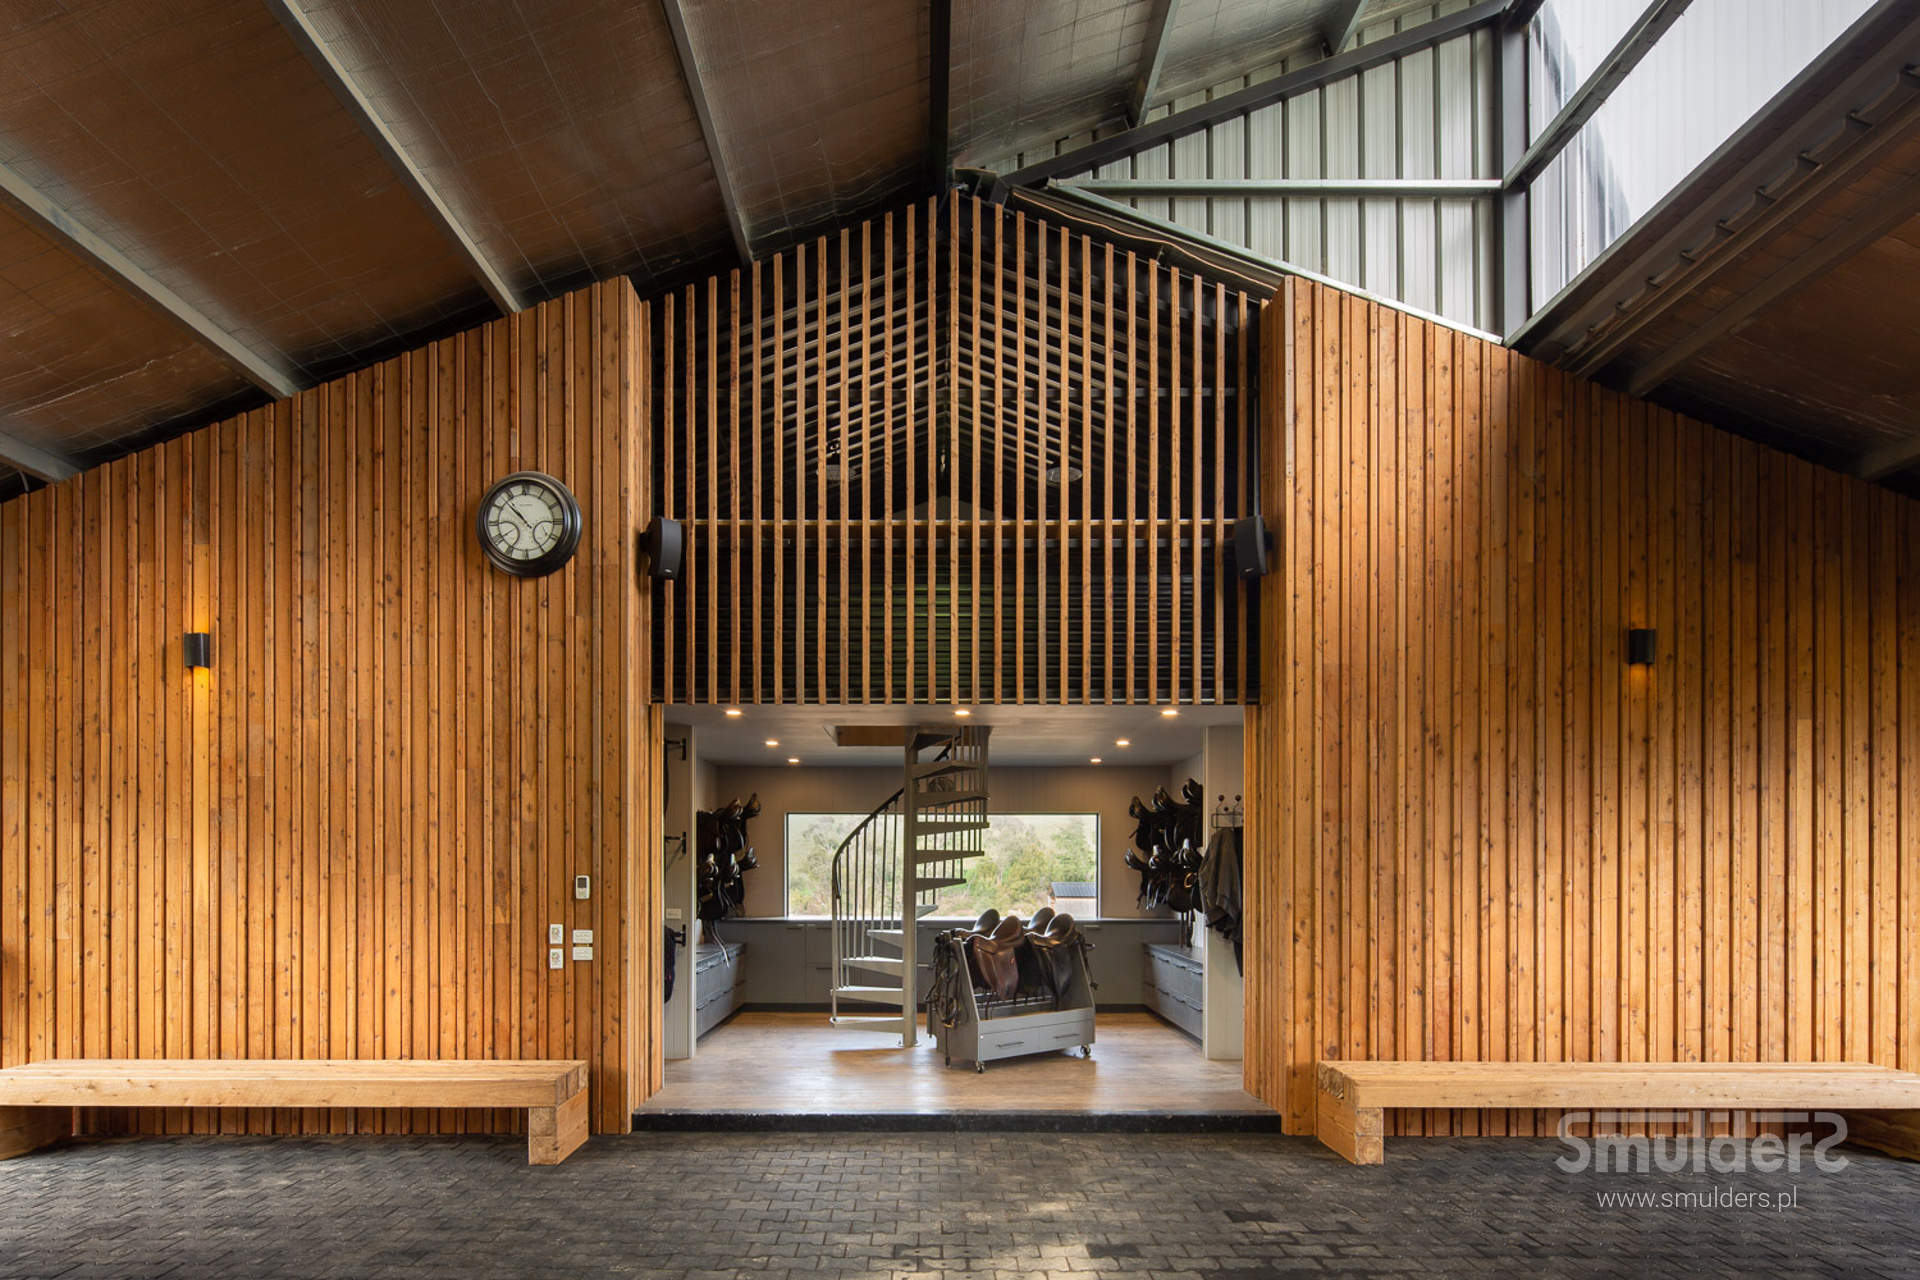 http://www.smulders.pl/wp-content/uploads/2019/10/f010_buckingham_barn-doors_doors_windows_KIL_SMULDERS_PL.jpg